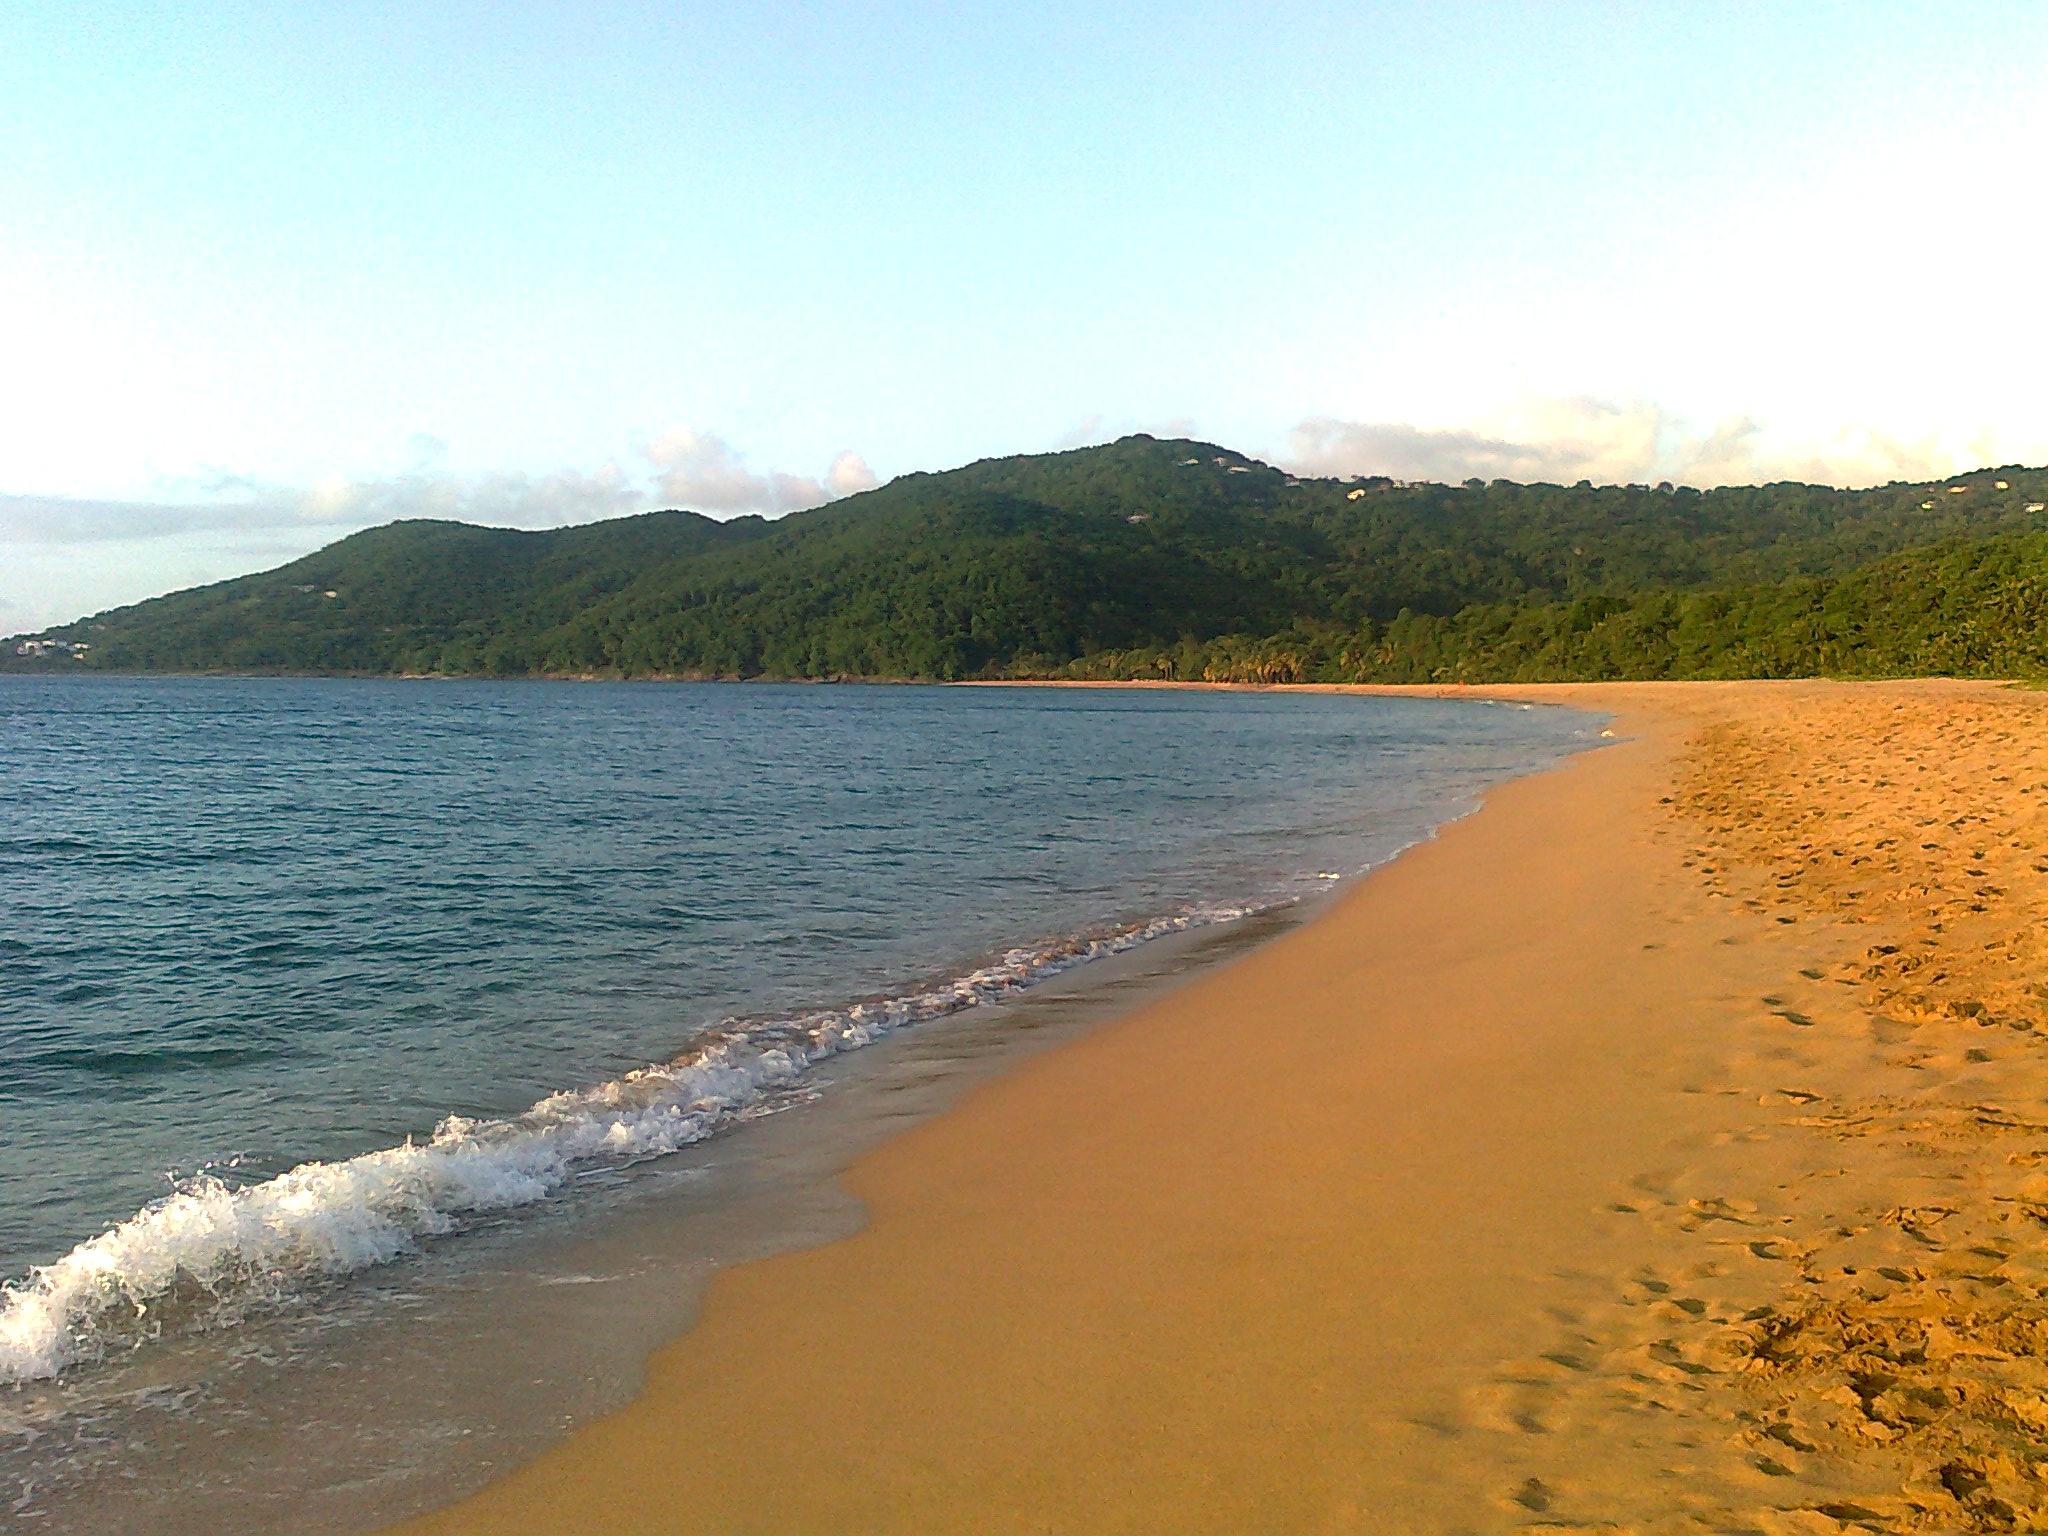 Deshaies plage de Grande Anse